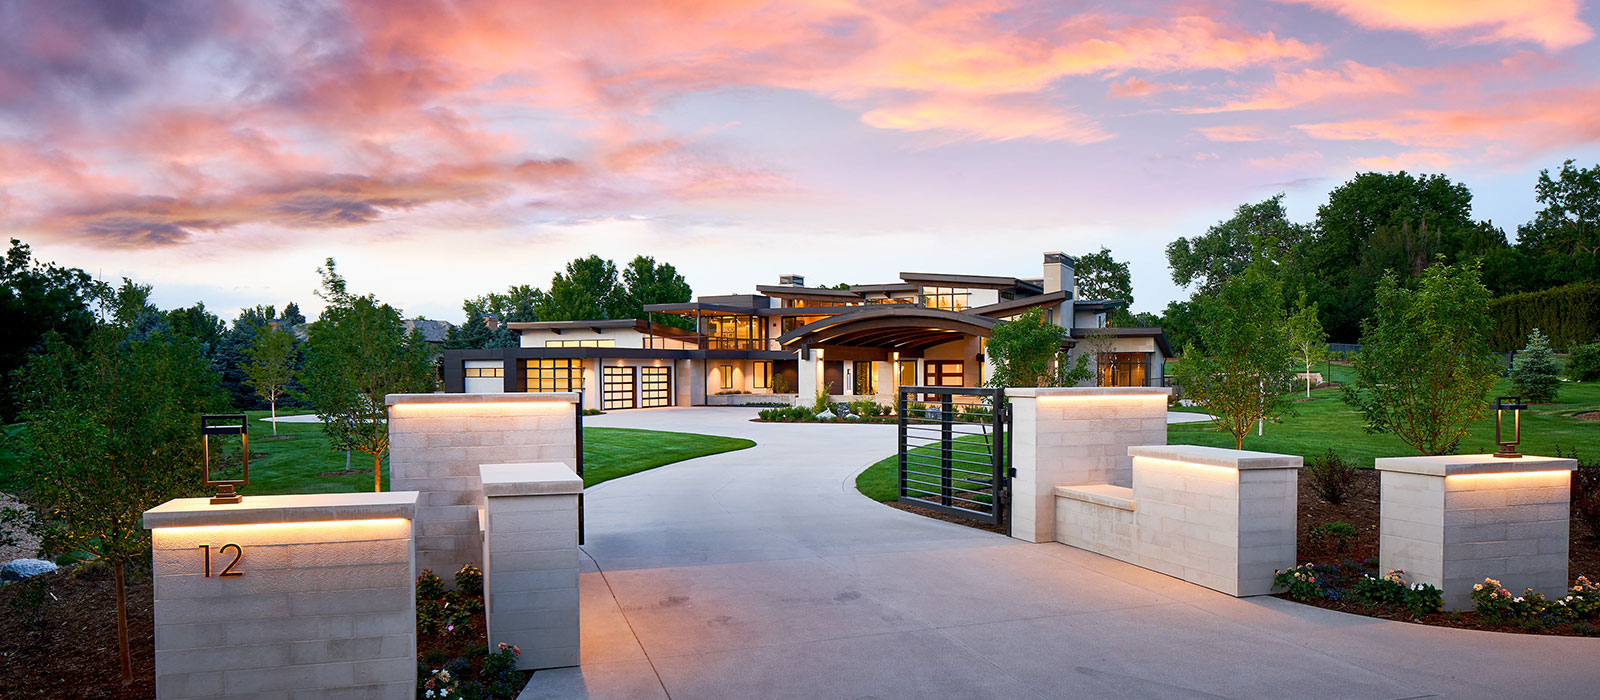 Modern Denver custom home designed by KGA Studio Architects